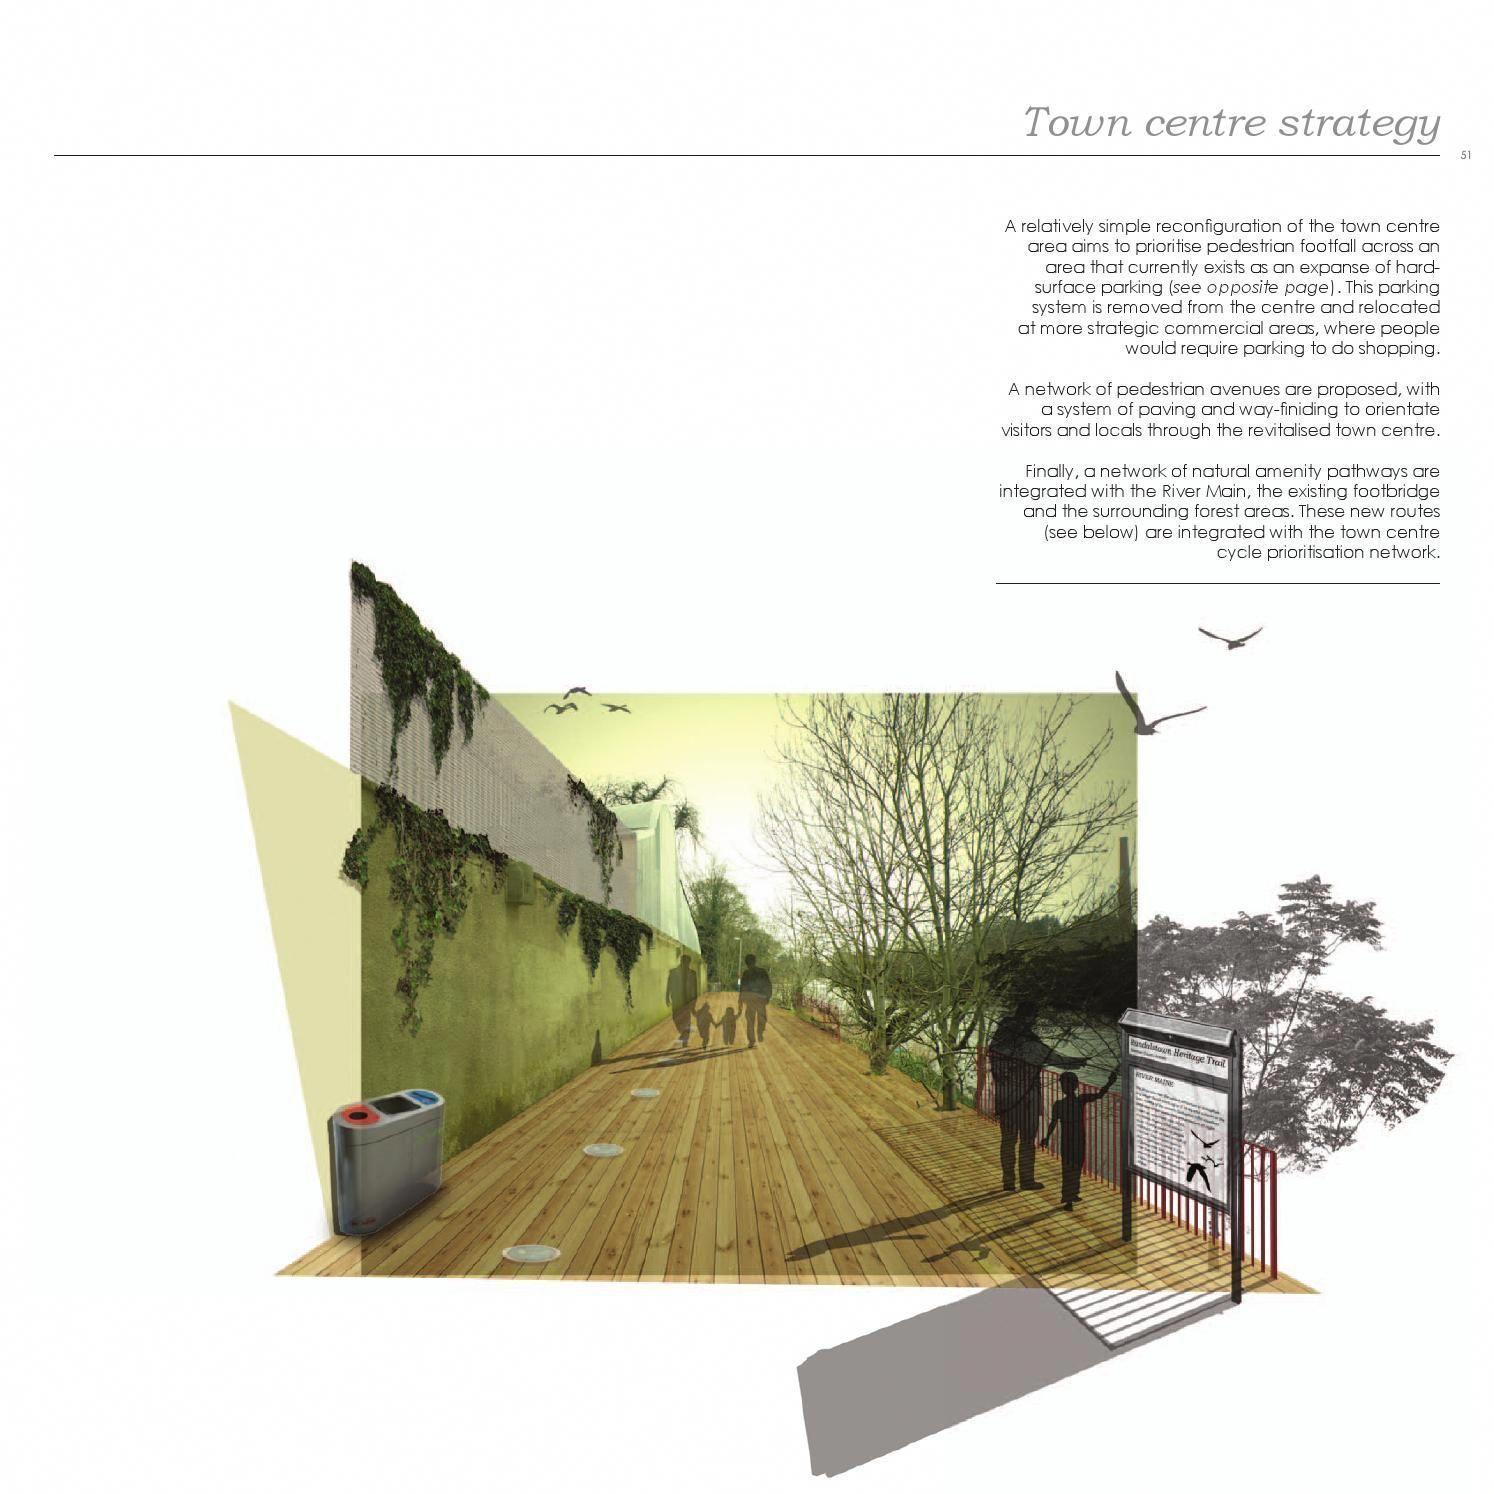 Issuu portfolio landscape architecture and urban design